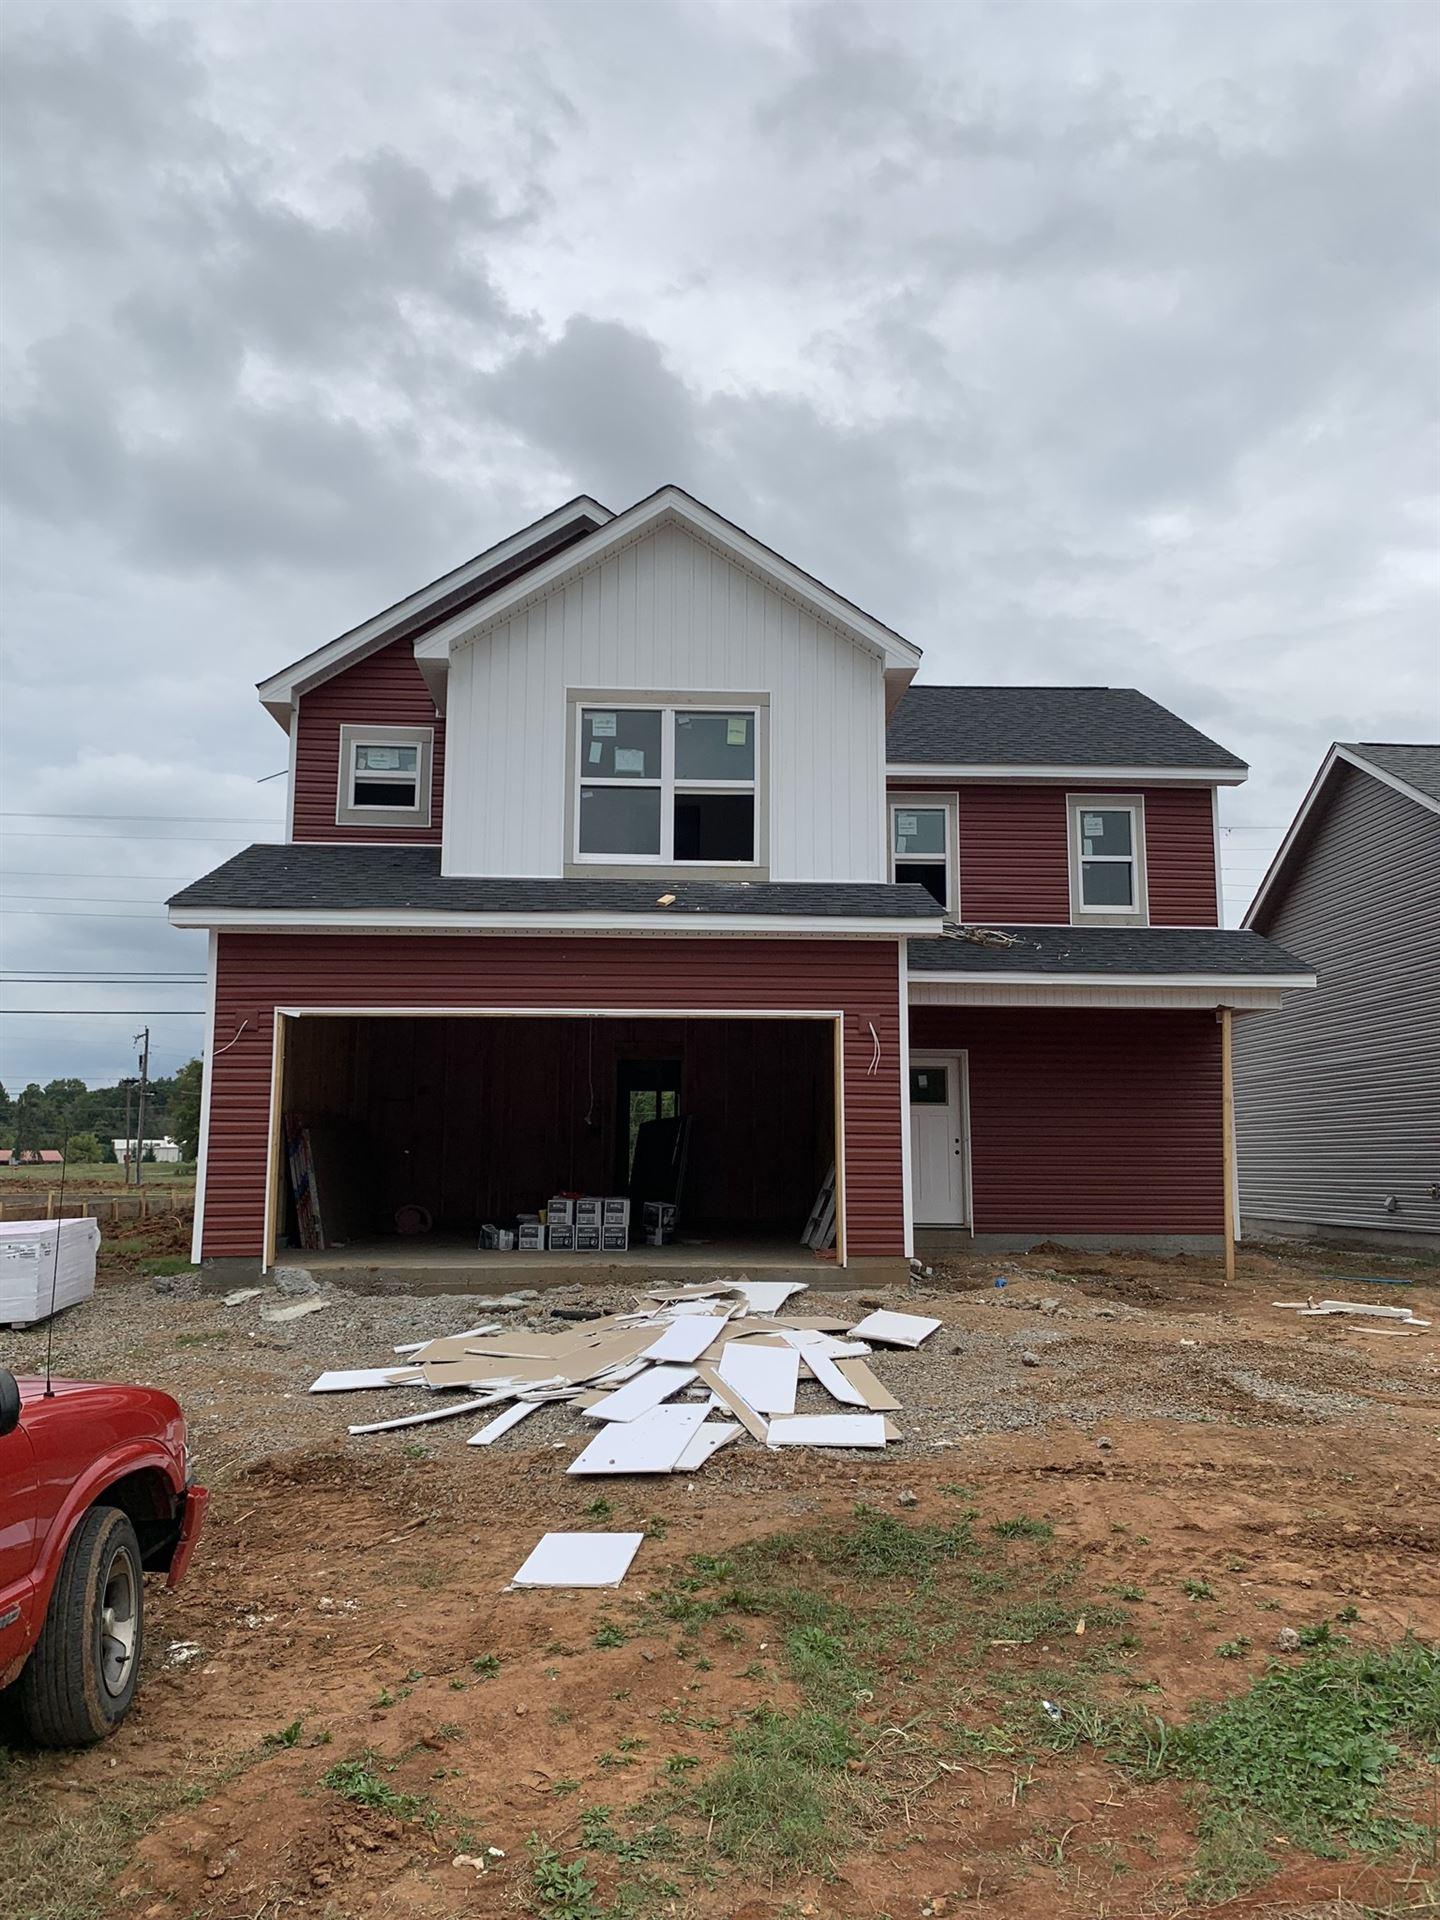 45 Campbell Heights, Clarksville, TN 37042 - MLS#: 2290520